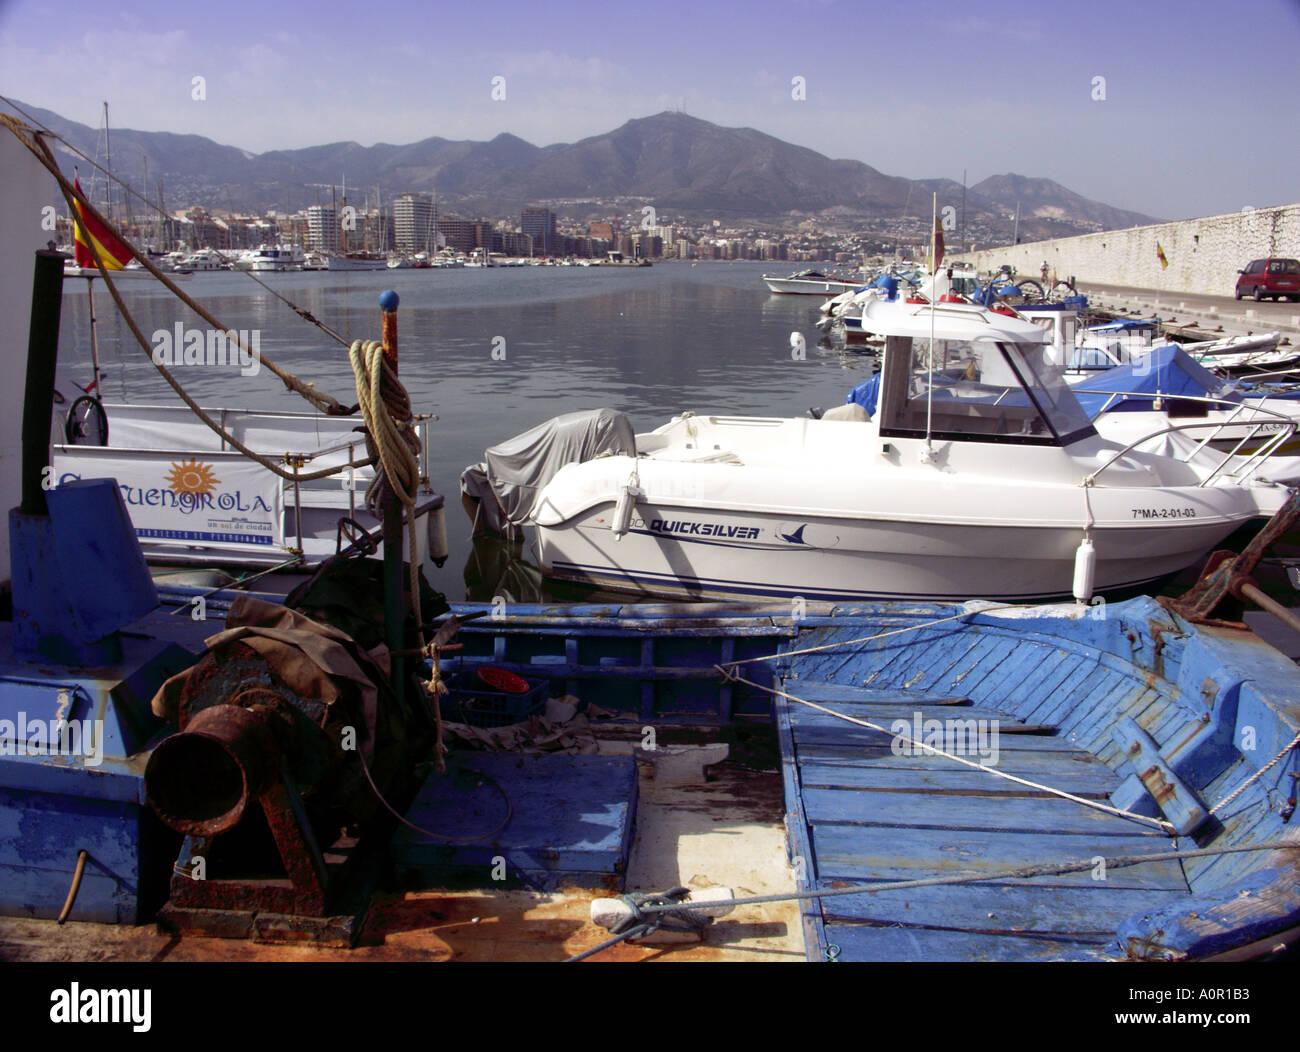 Commercial Fishing Boats, Puerto Deportivo de Fuengirola, Fuengirola Port, Costa del Sol, Spain, Europe - Stock Image